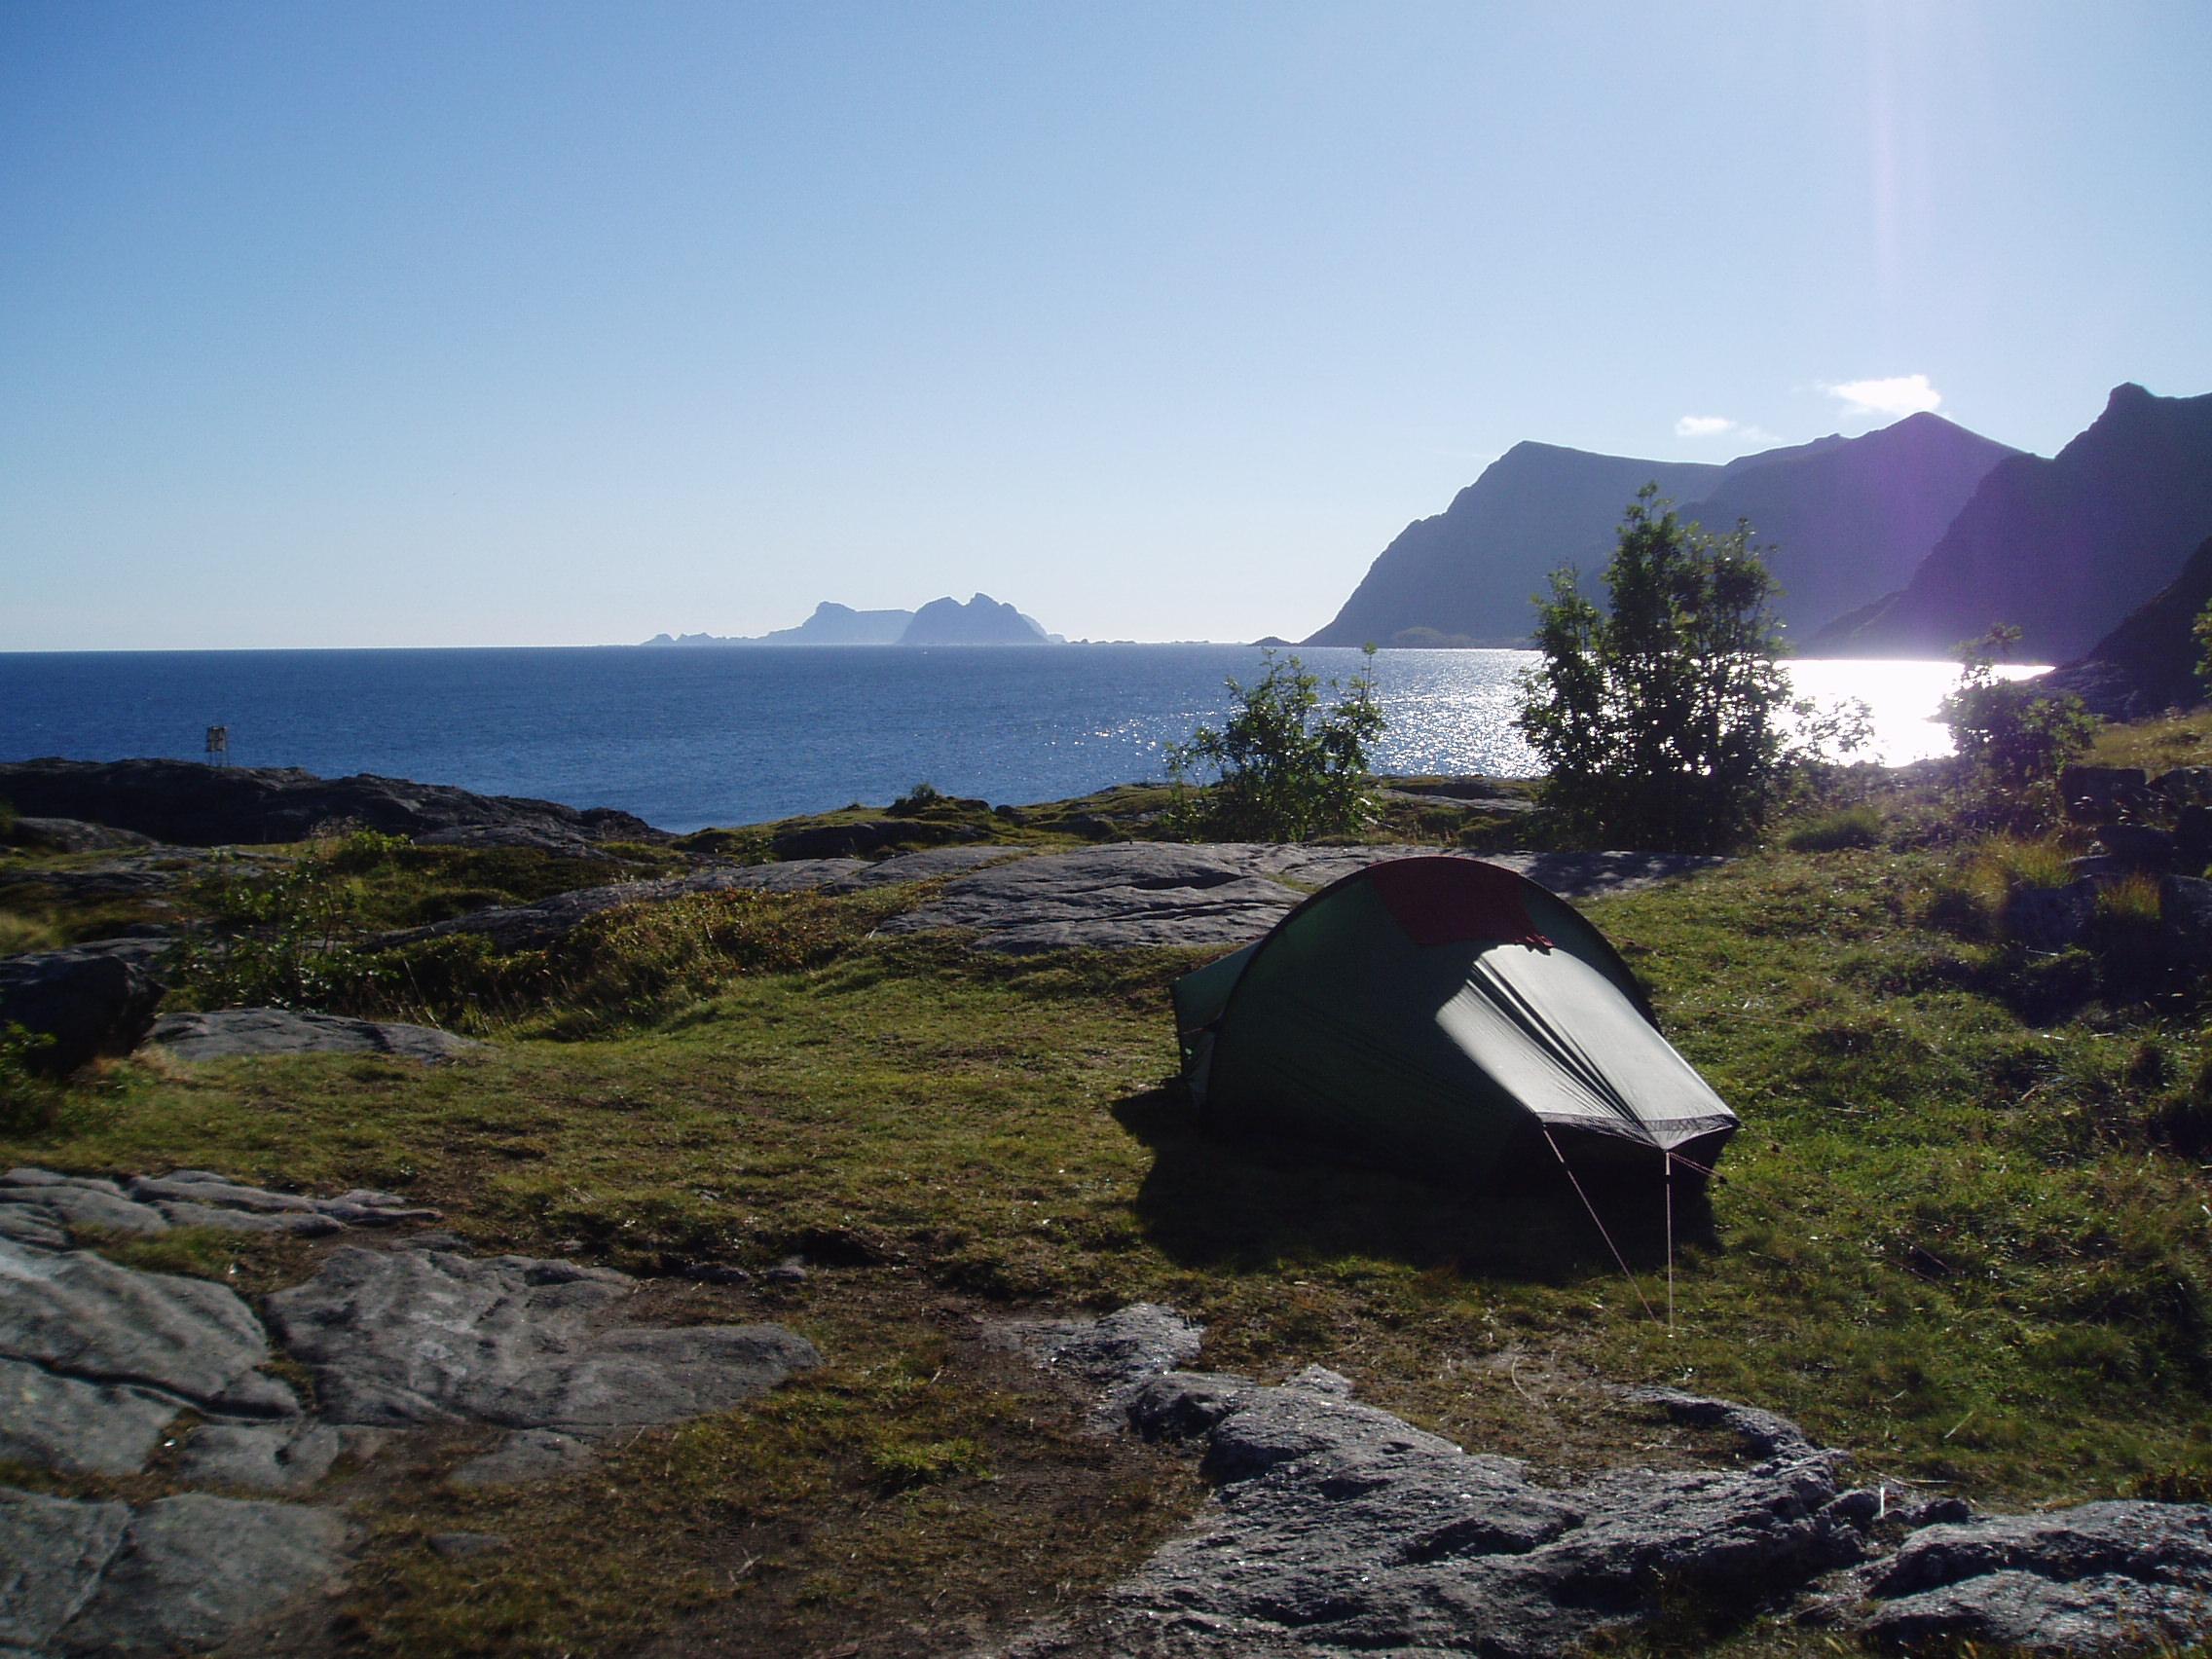 Islands Camping